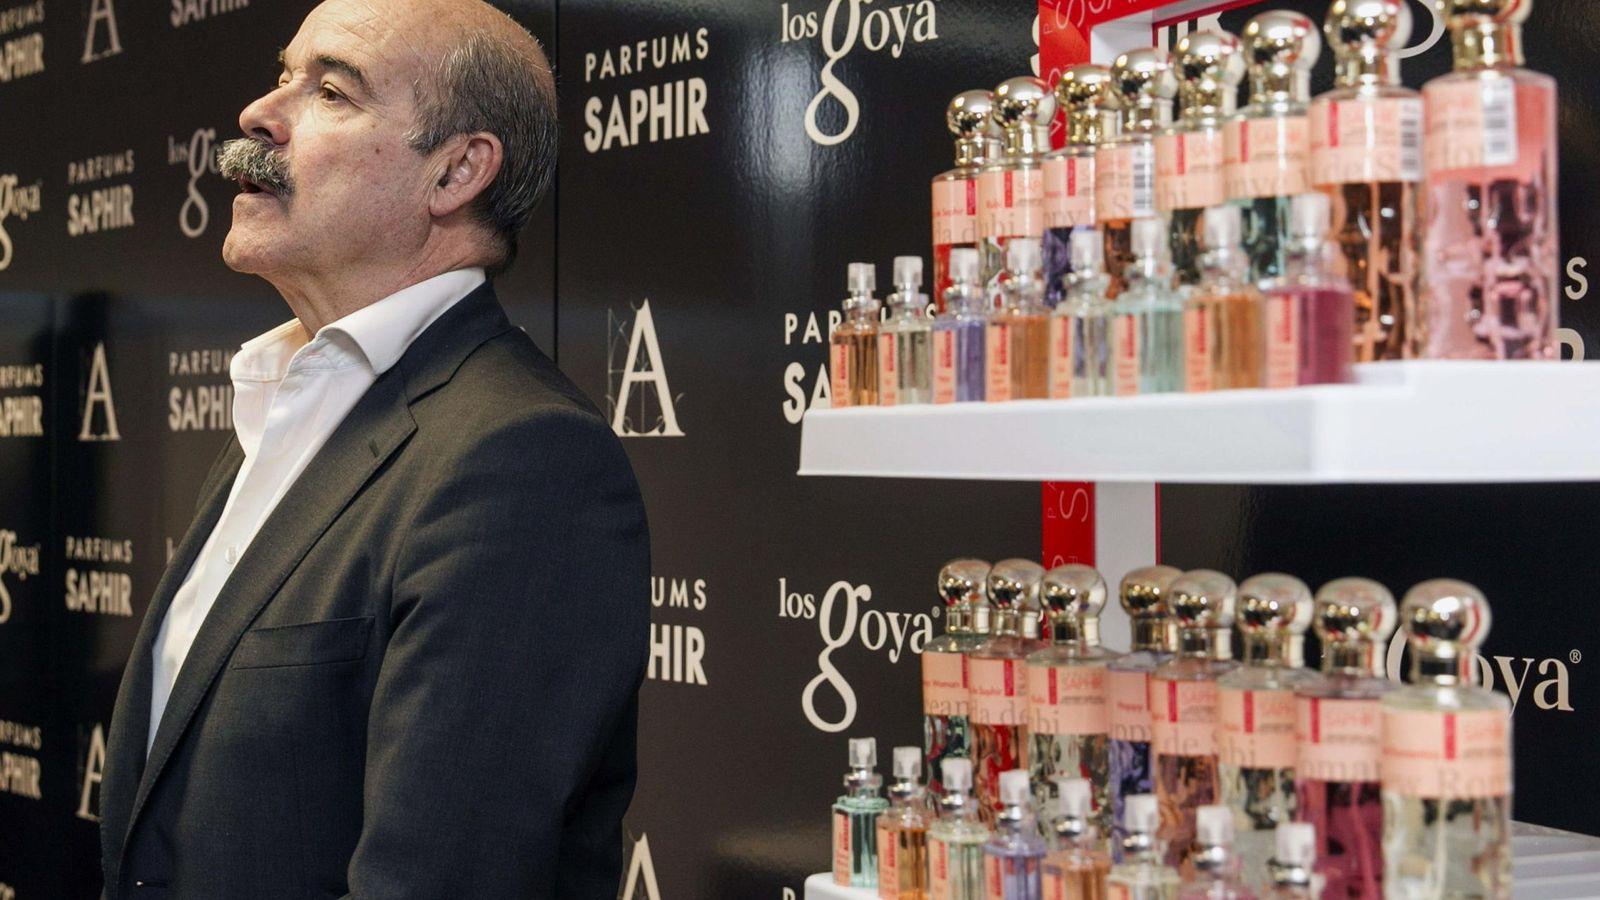 Tiendas La Guerra Del Perfume Pirata La Patronal Cosmética